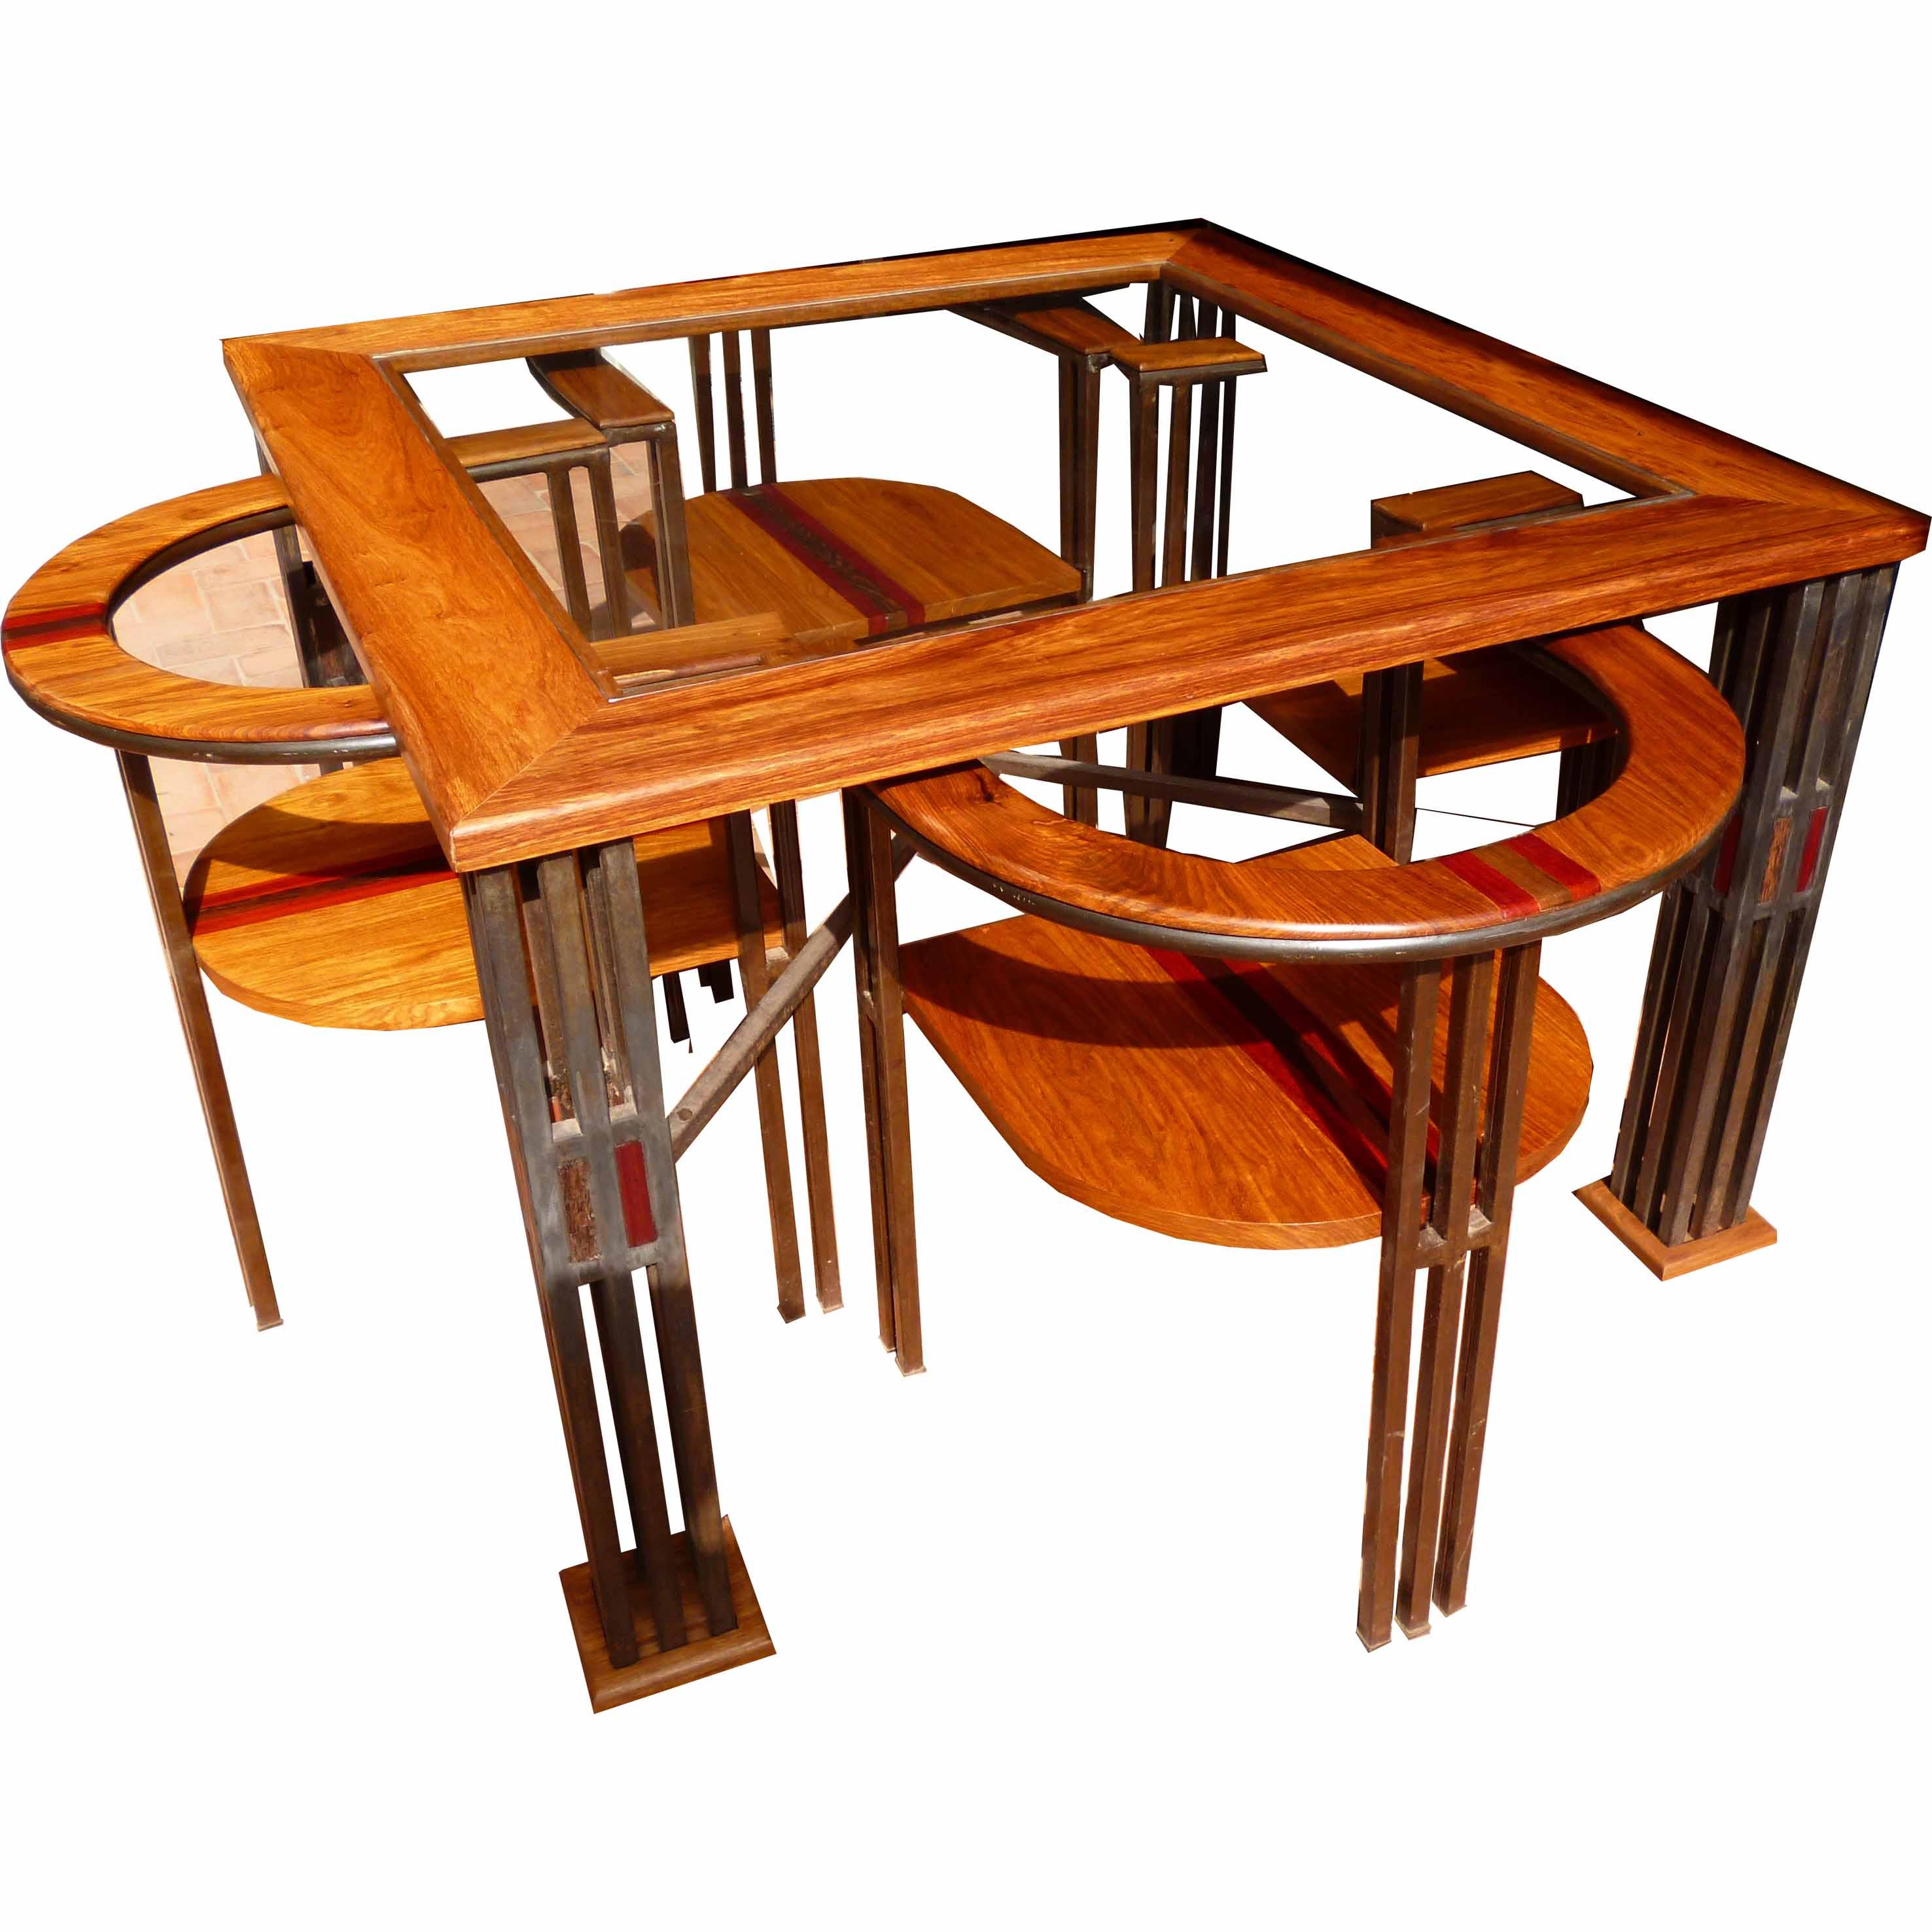 table salle manger et chaises galerie arte. Black Bedroom Furniture Sets. Home Design Ideas